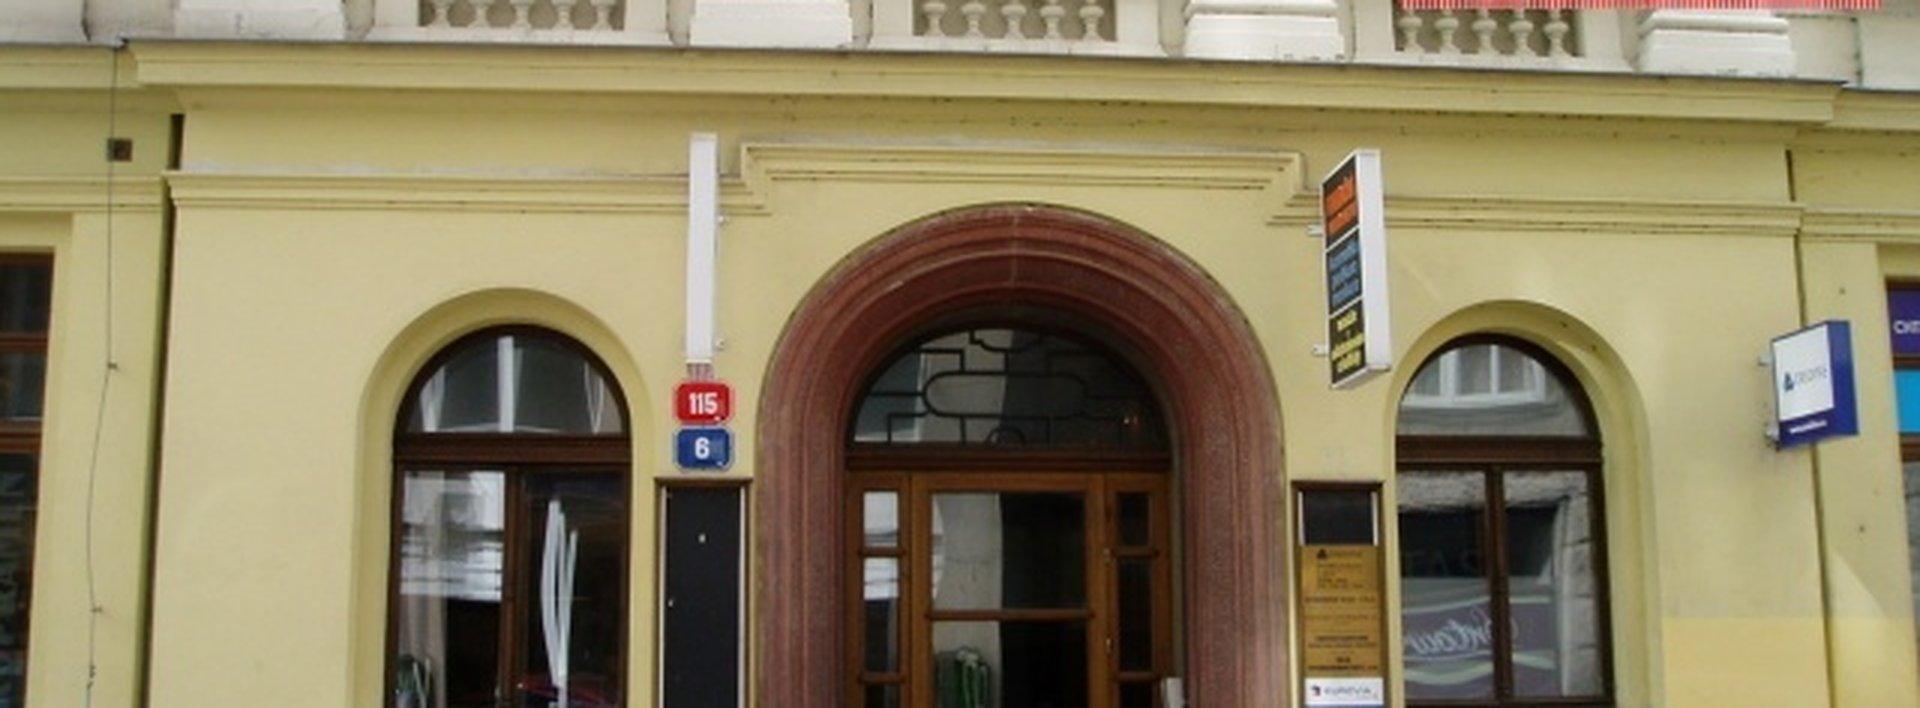 Pronájem kanceláře 36 m² - Soukenné nám. Liberec III-Jeřáb, Ev.č.: N49086